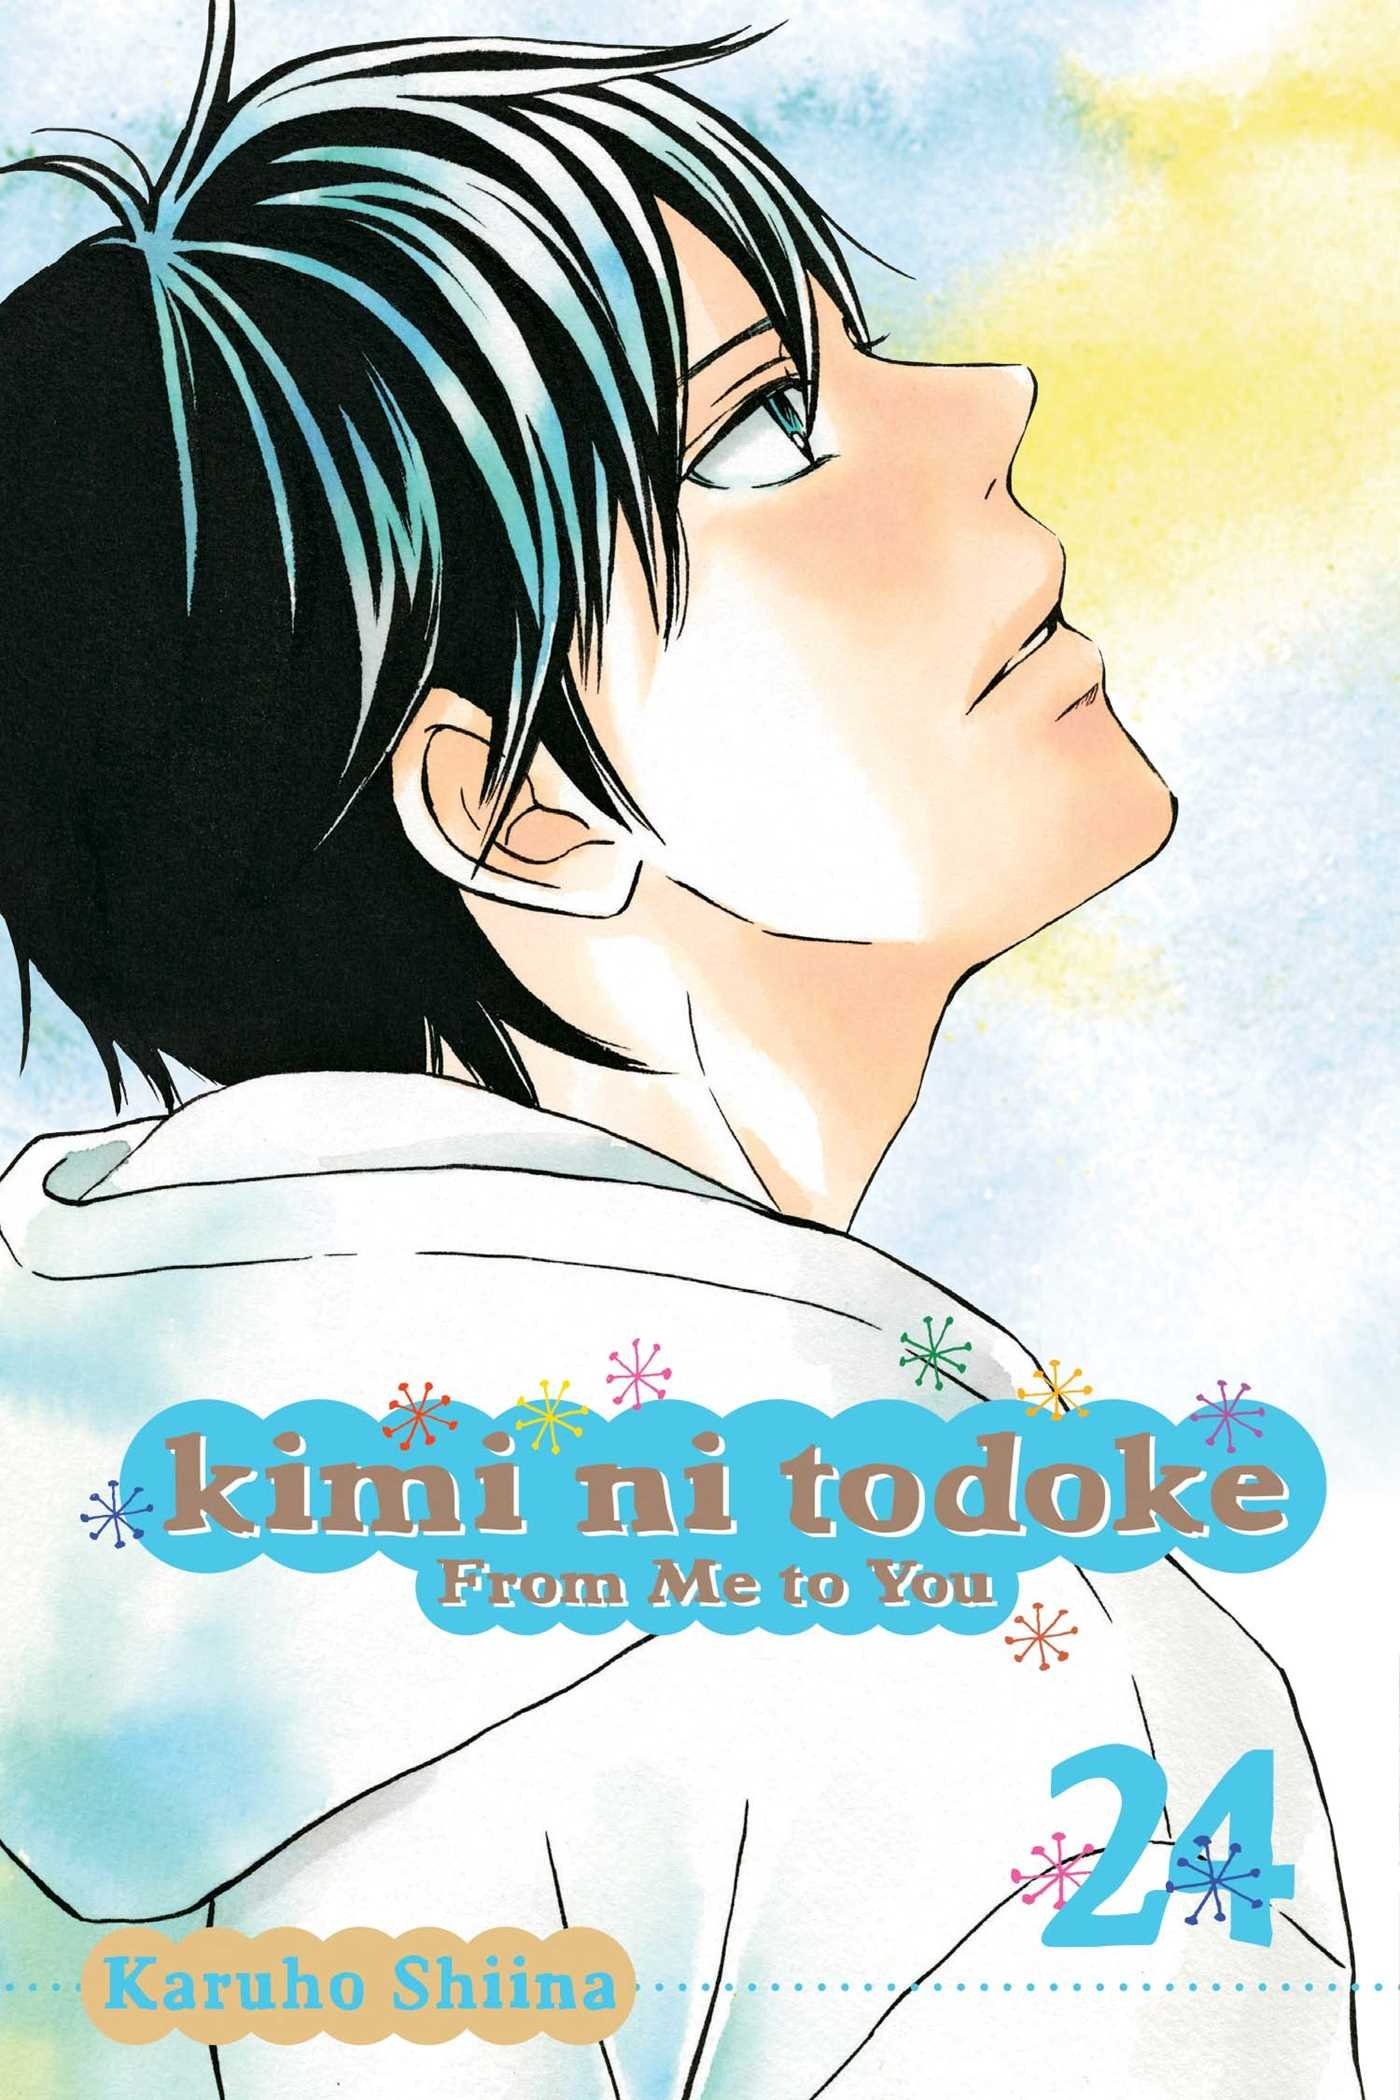 Amazon.com: Kimi ni Todoke: From Me to You, Vol. 24 (9781421585864): Karuho  Shiina: Books